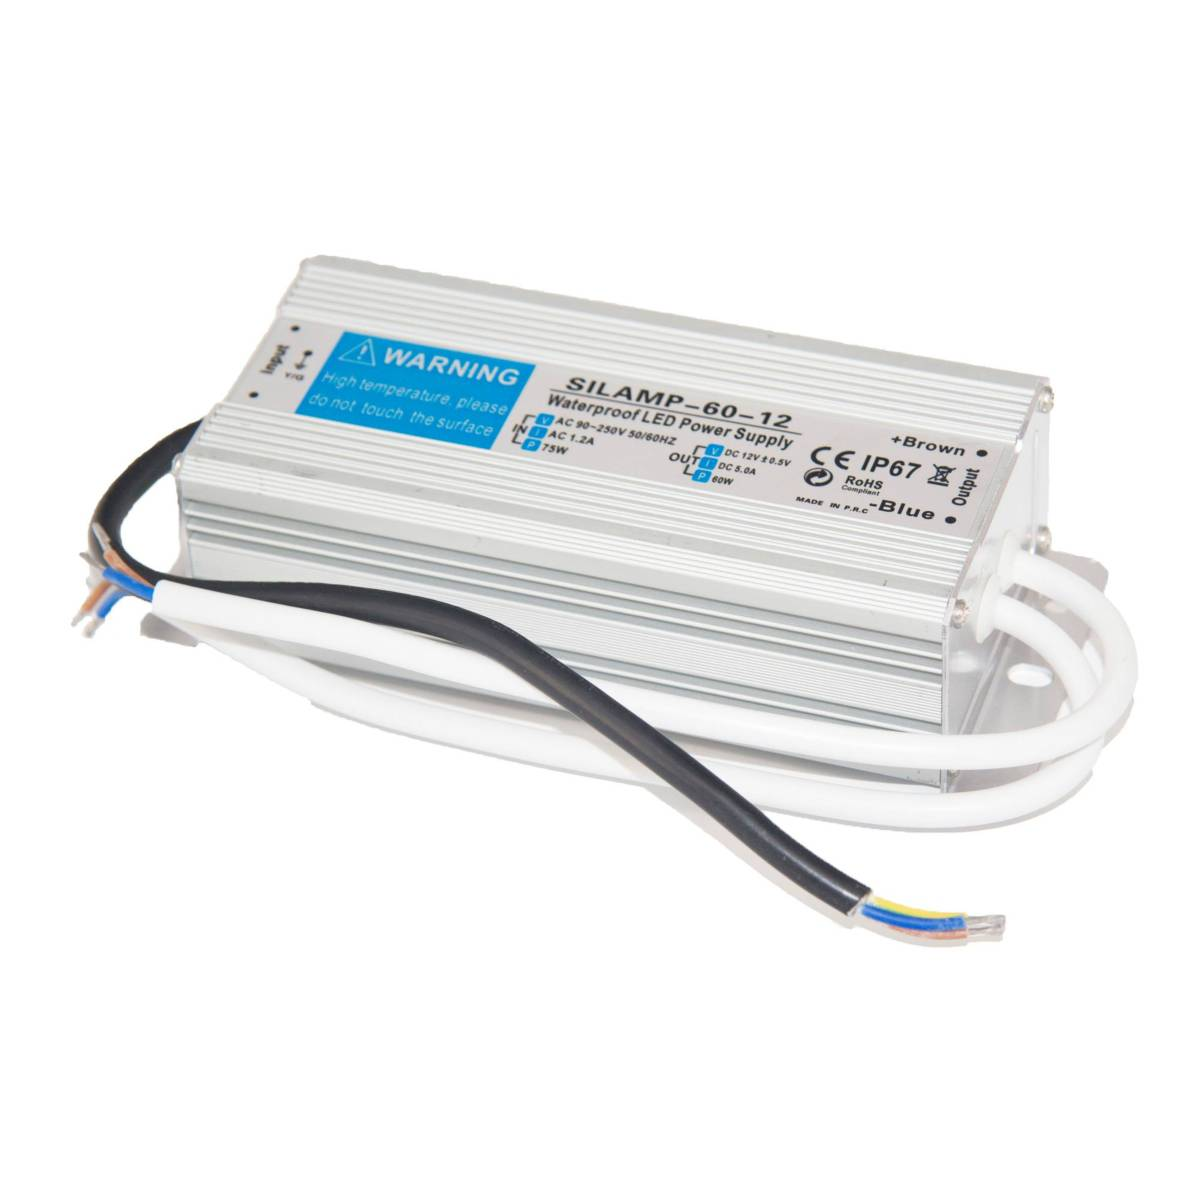 SILAMP Transformateur 220V 12V IP67 60W DC 5A